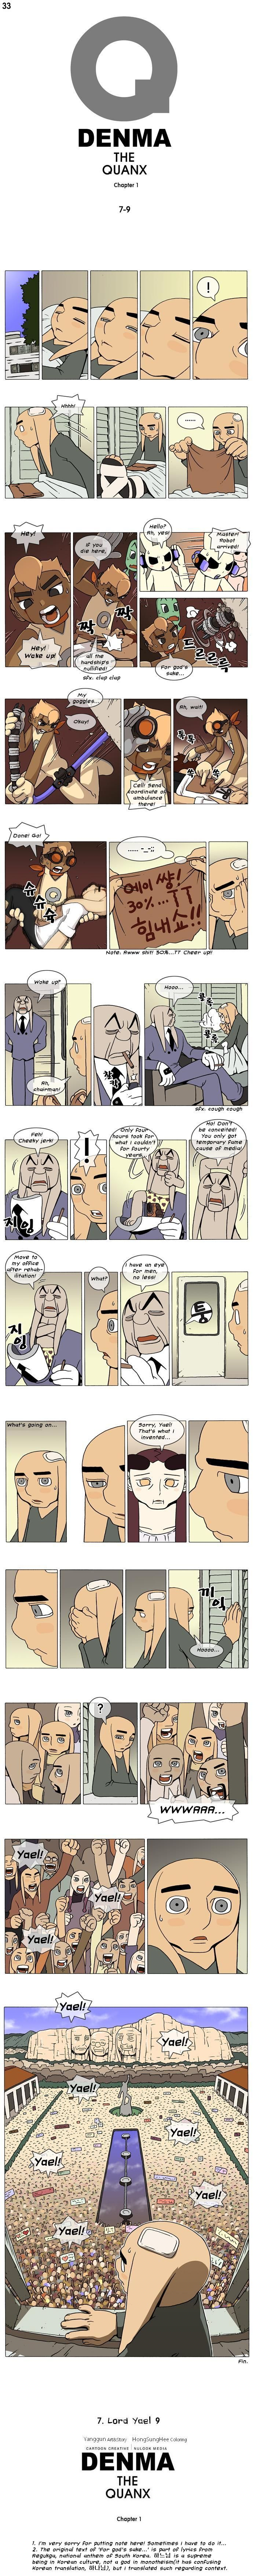 Denma 33 Page 1